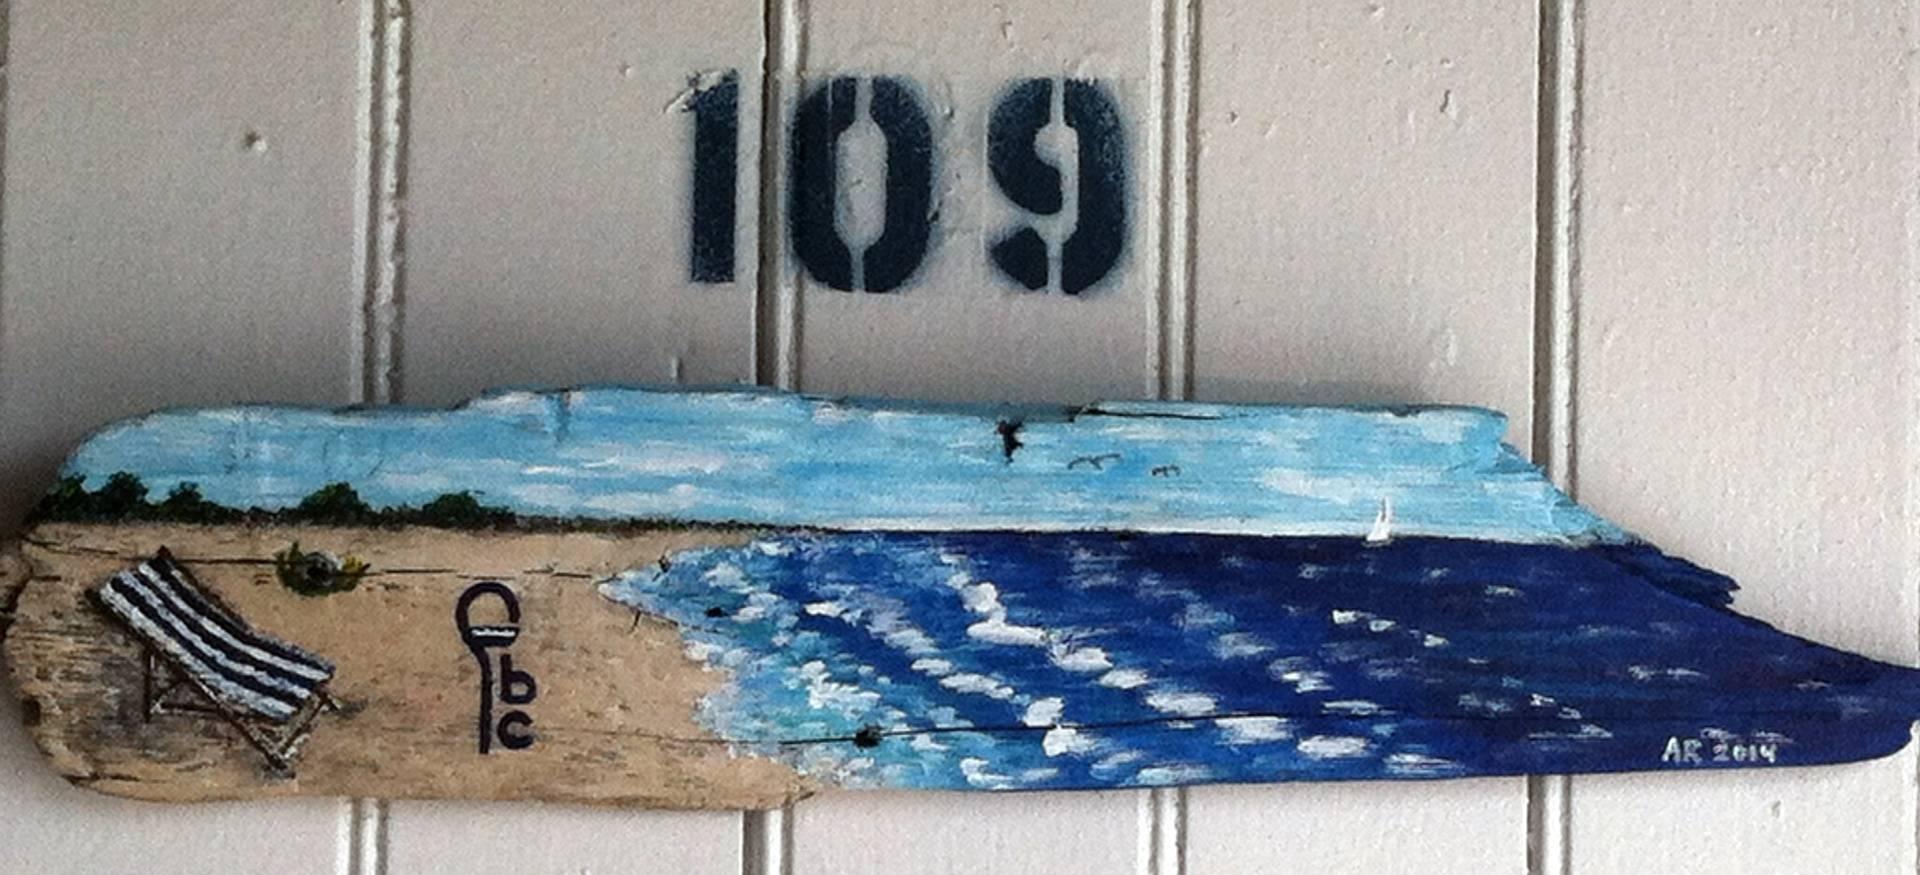 Beach Locker Sign